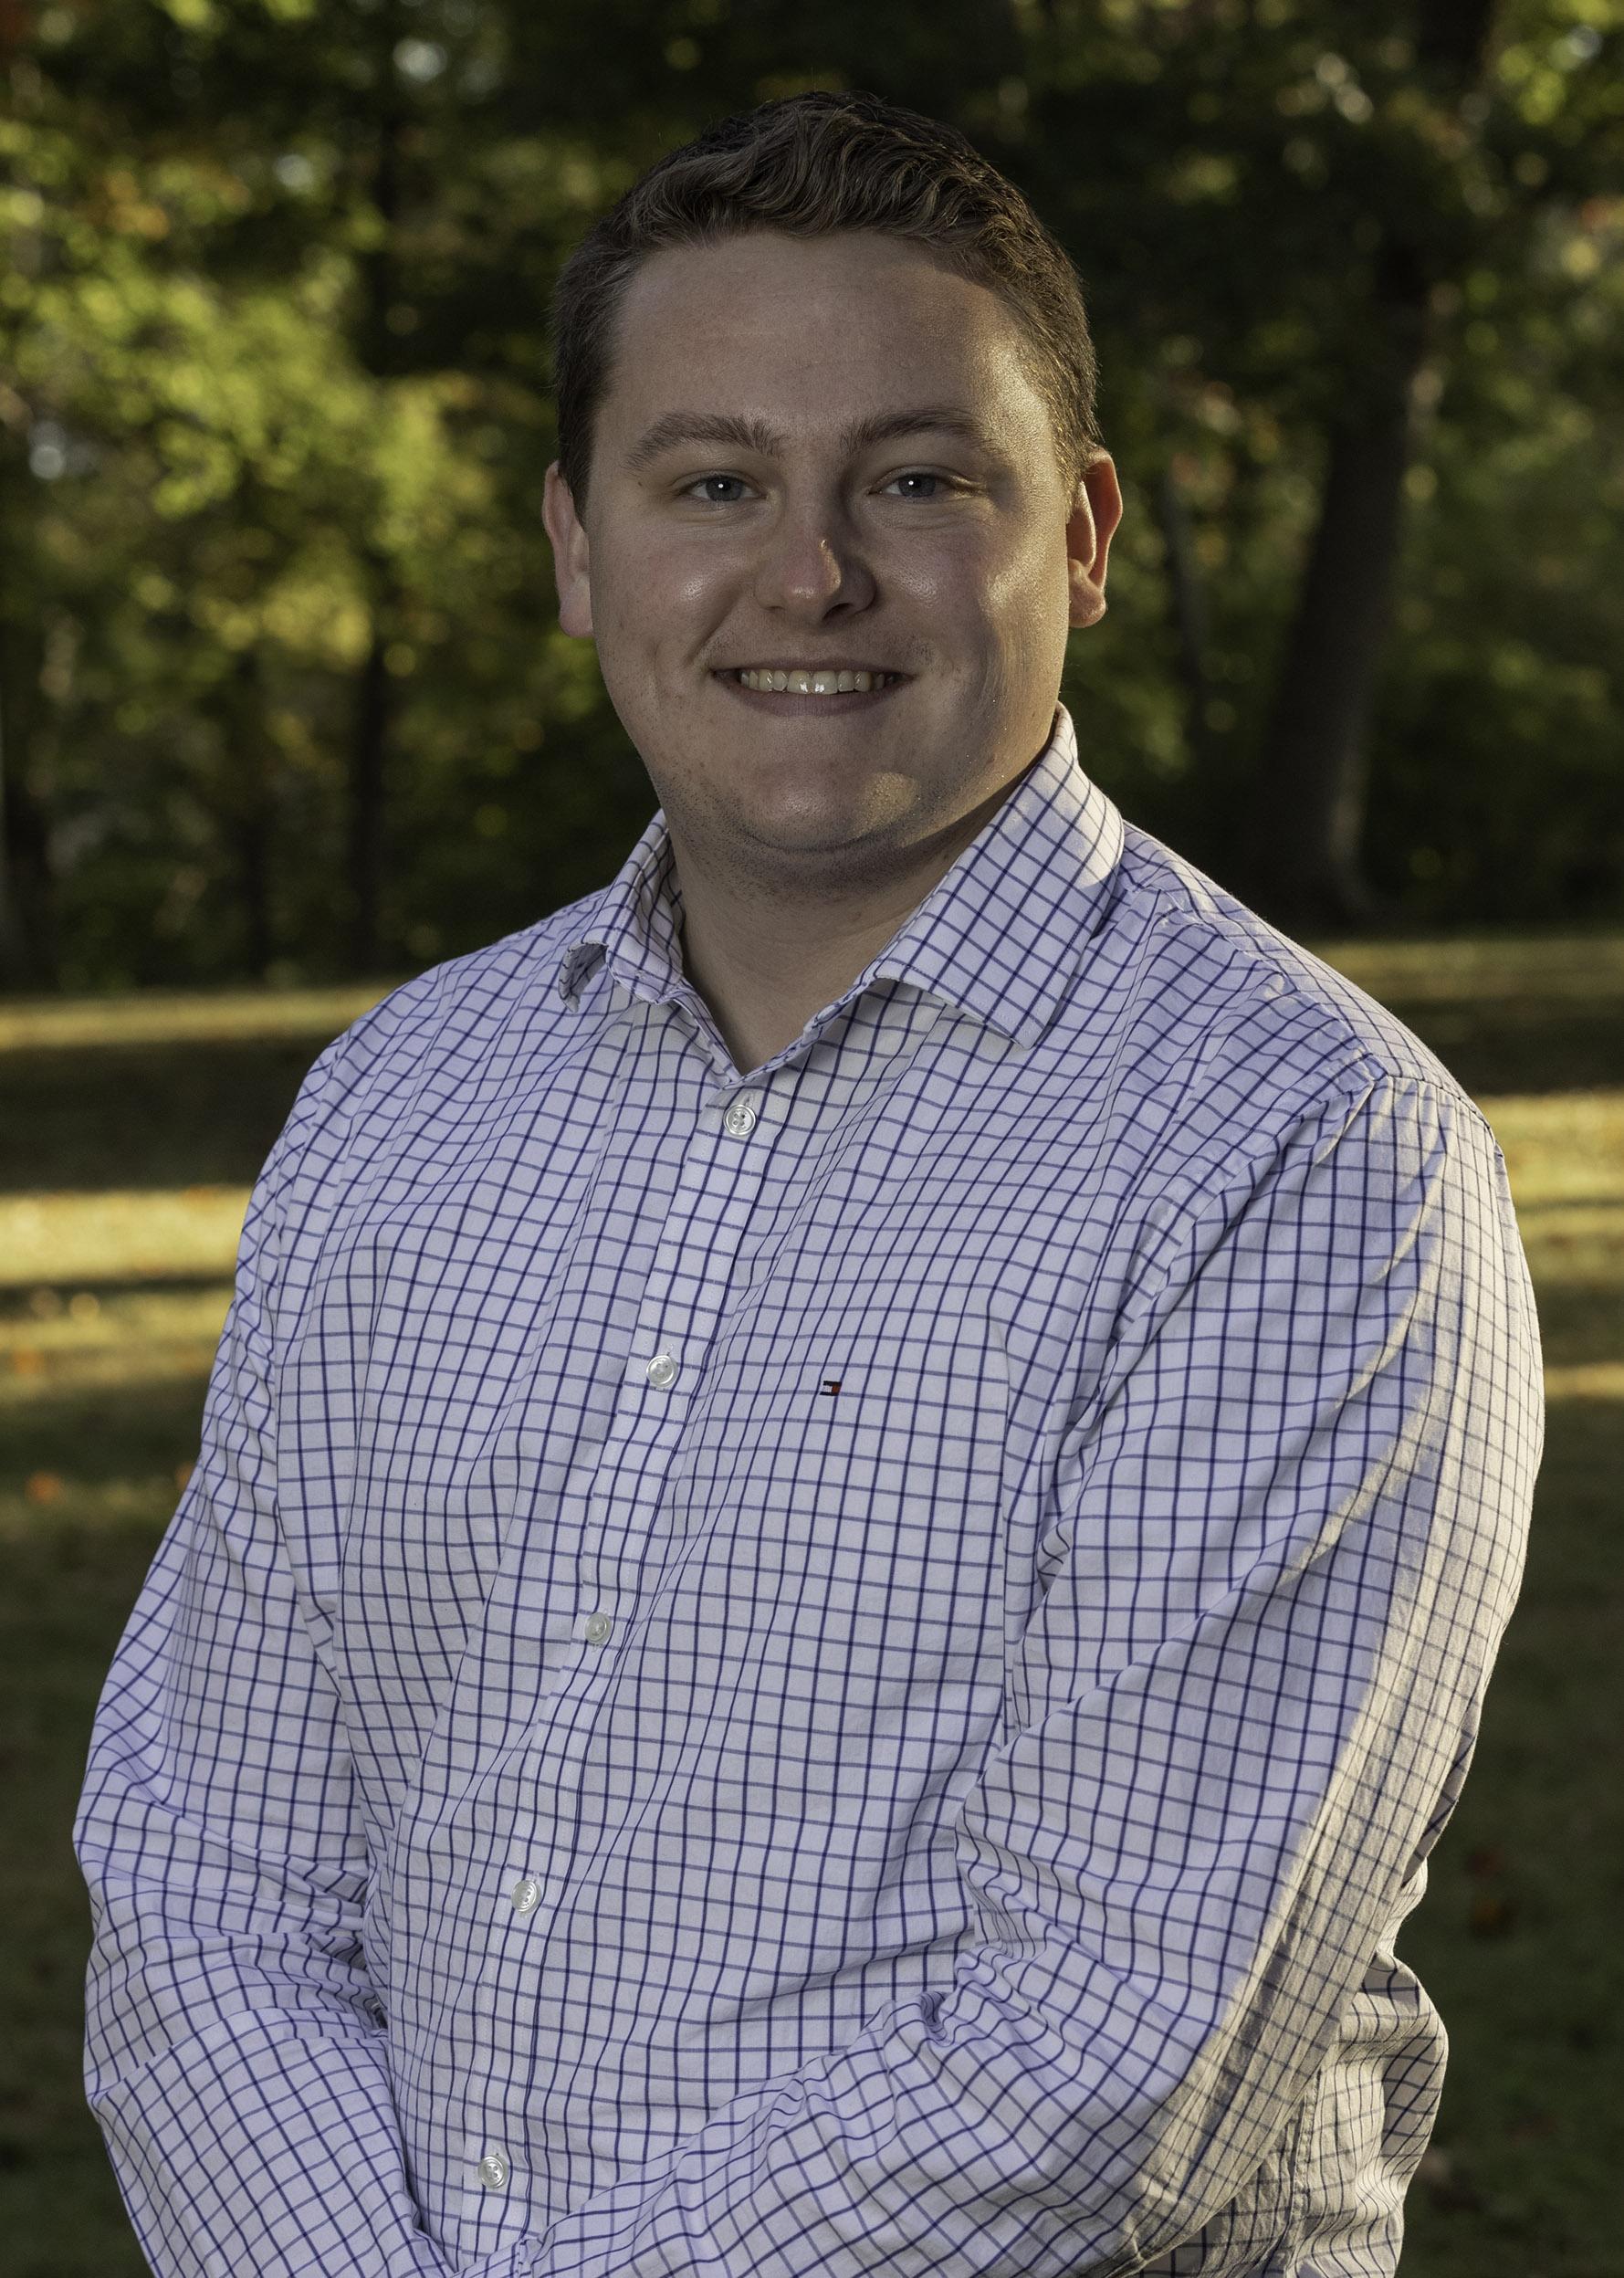 Tyler Amicon : Professional Civil Engineer, Director of Ohio Engineering